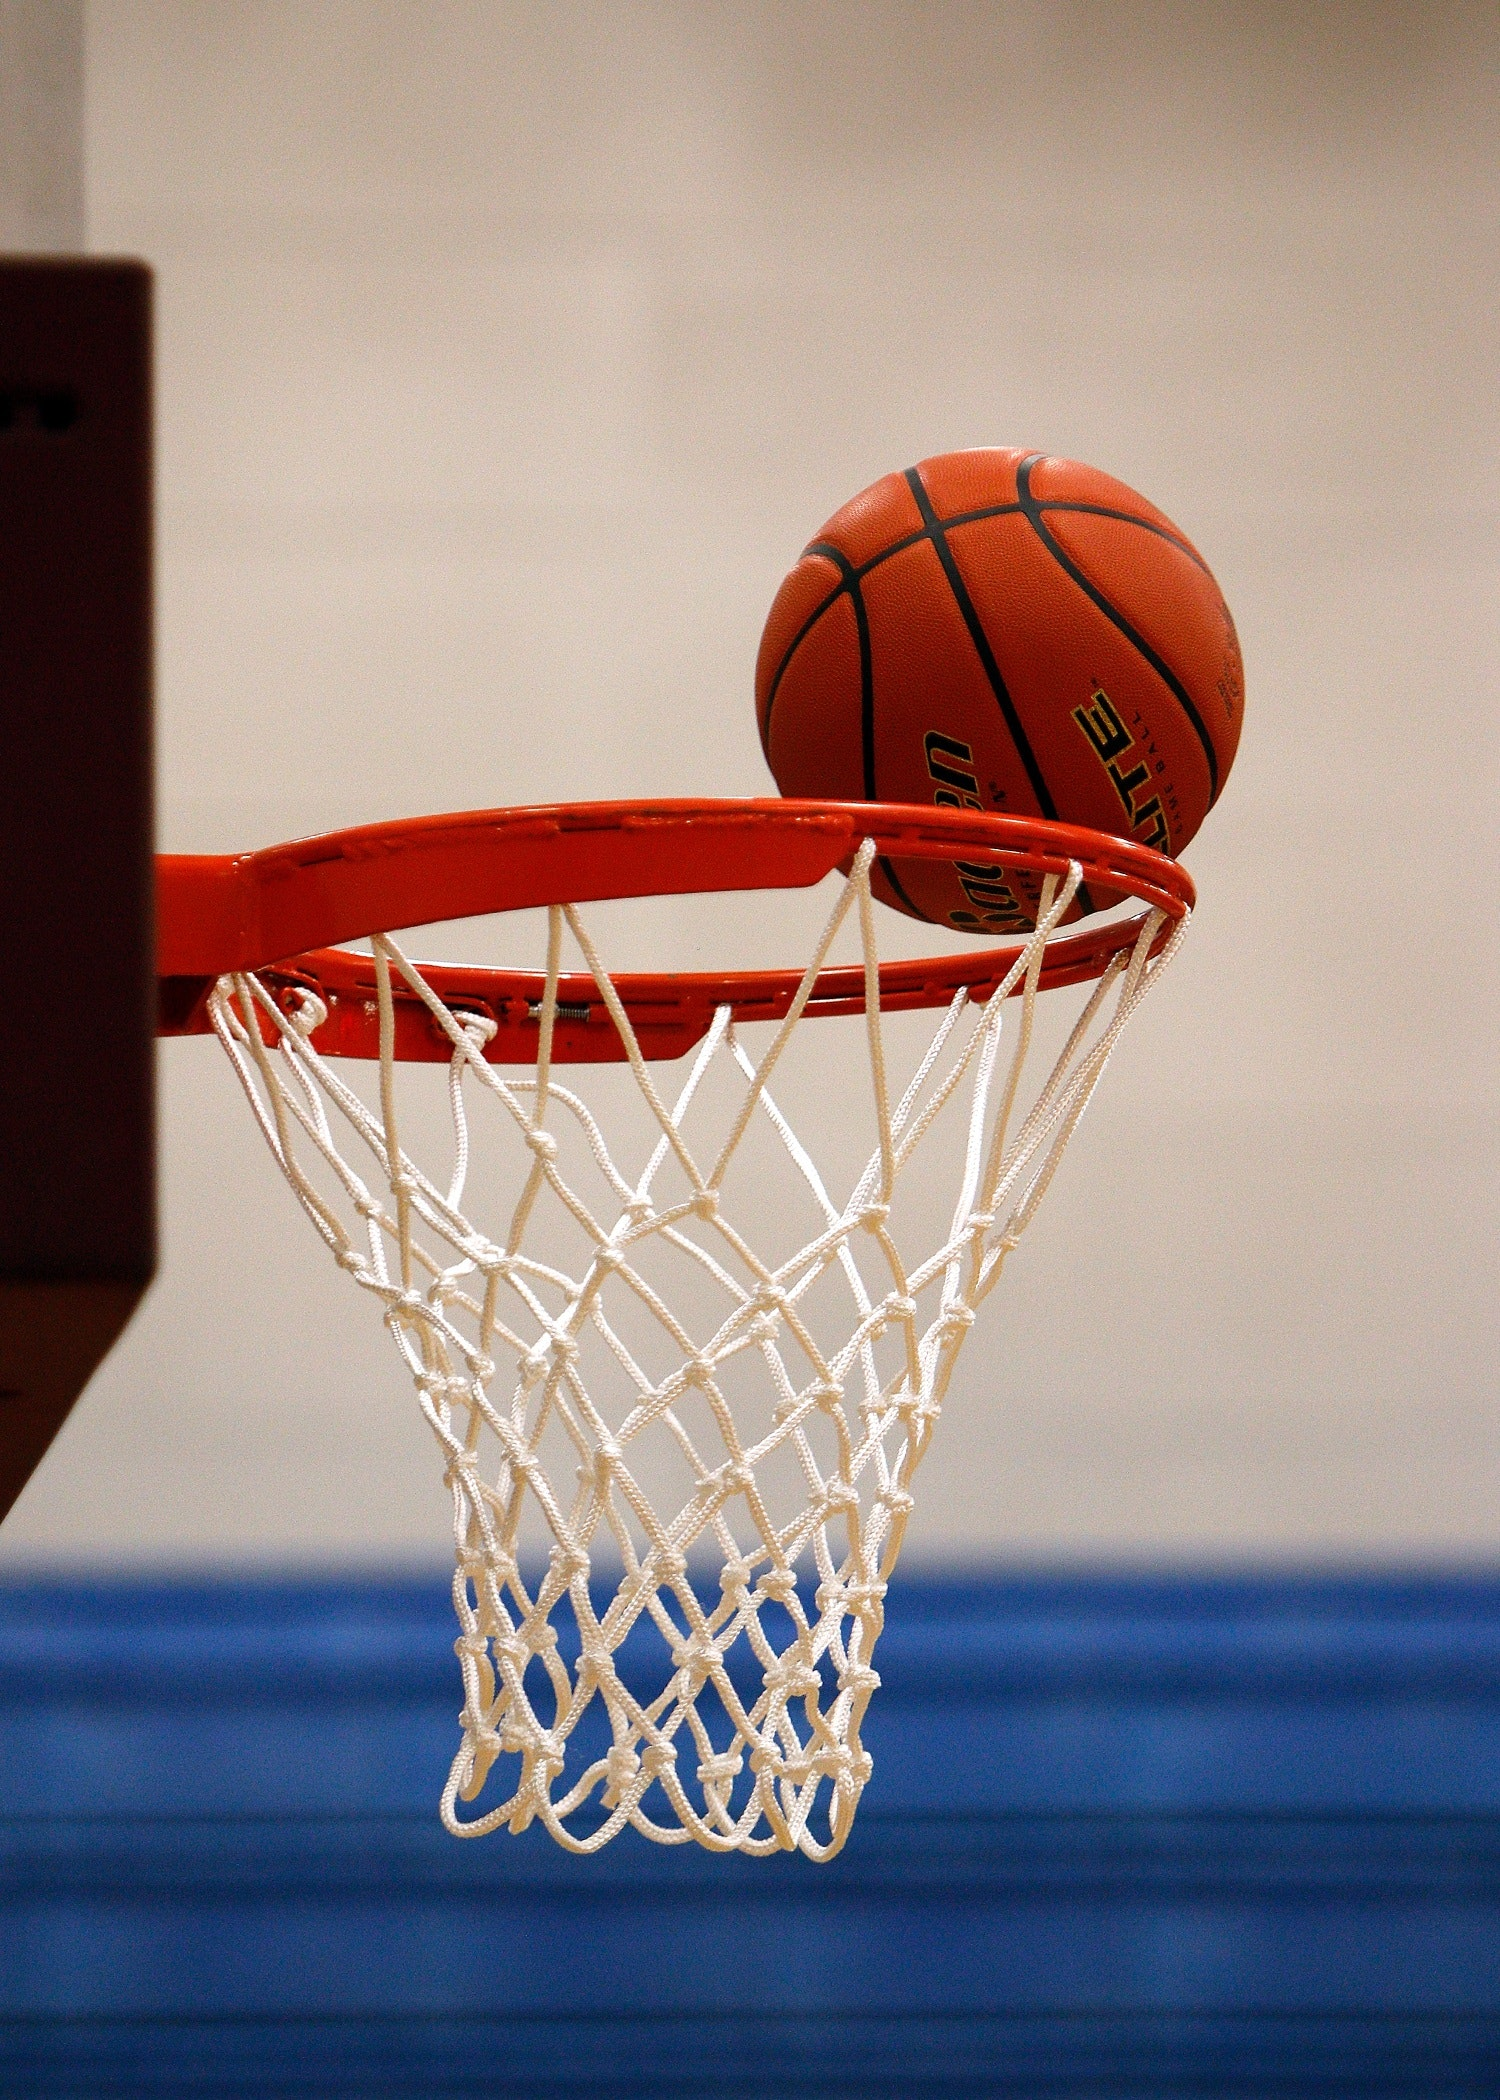 action-backboard-ball-basketball-358042